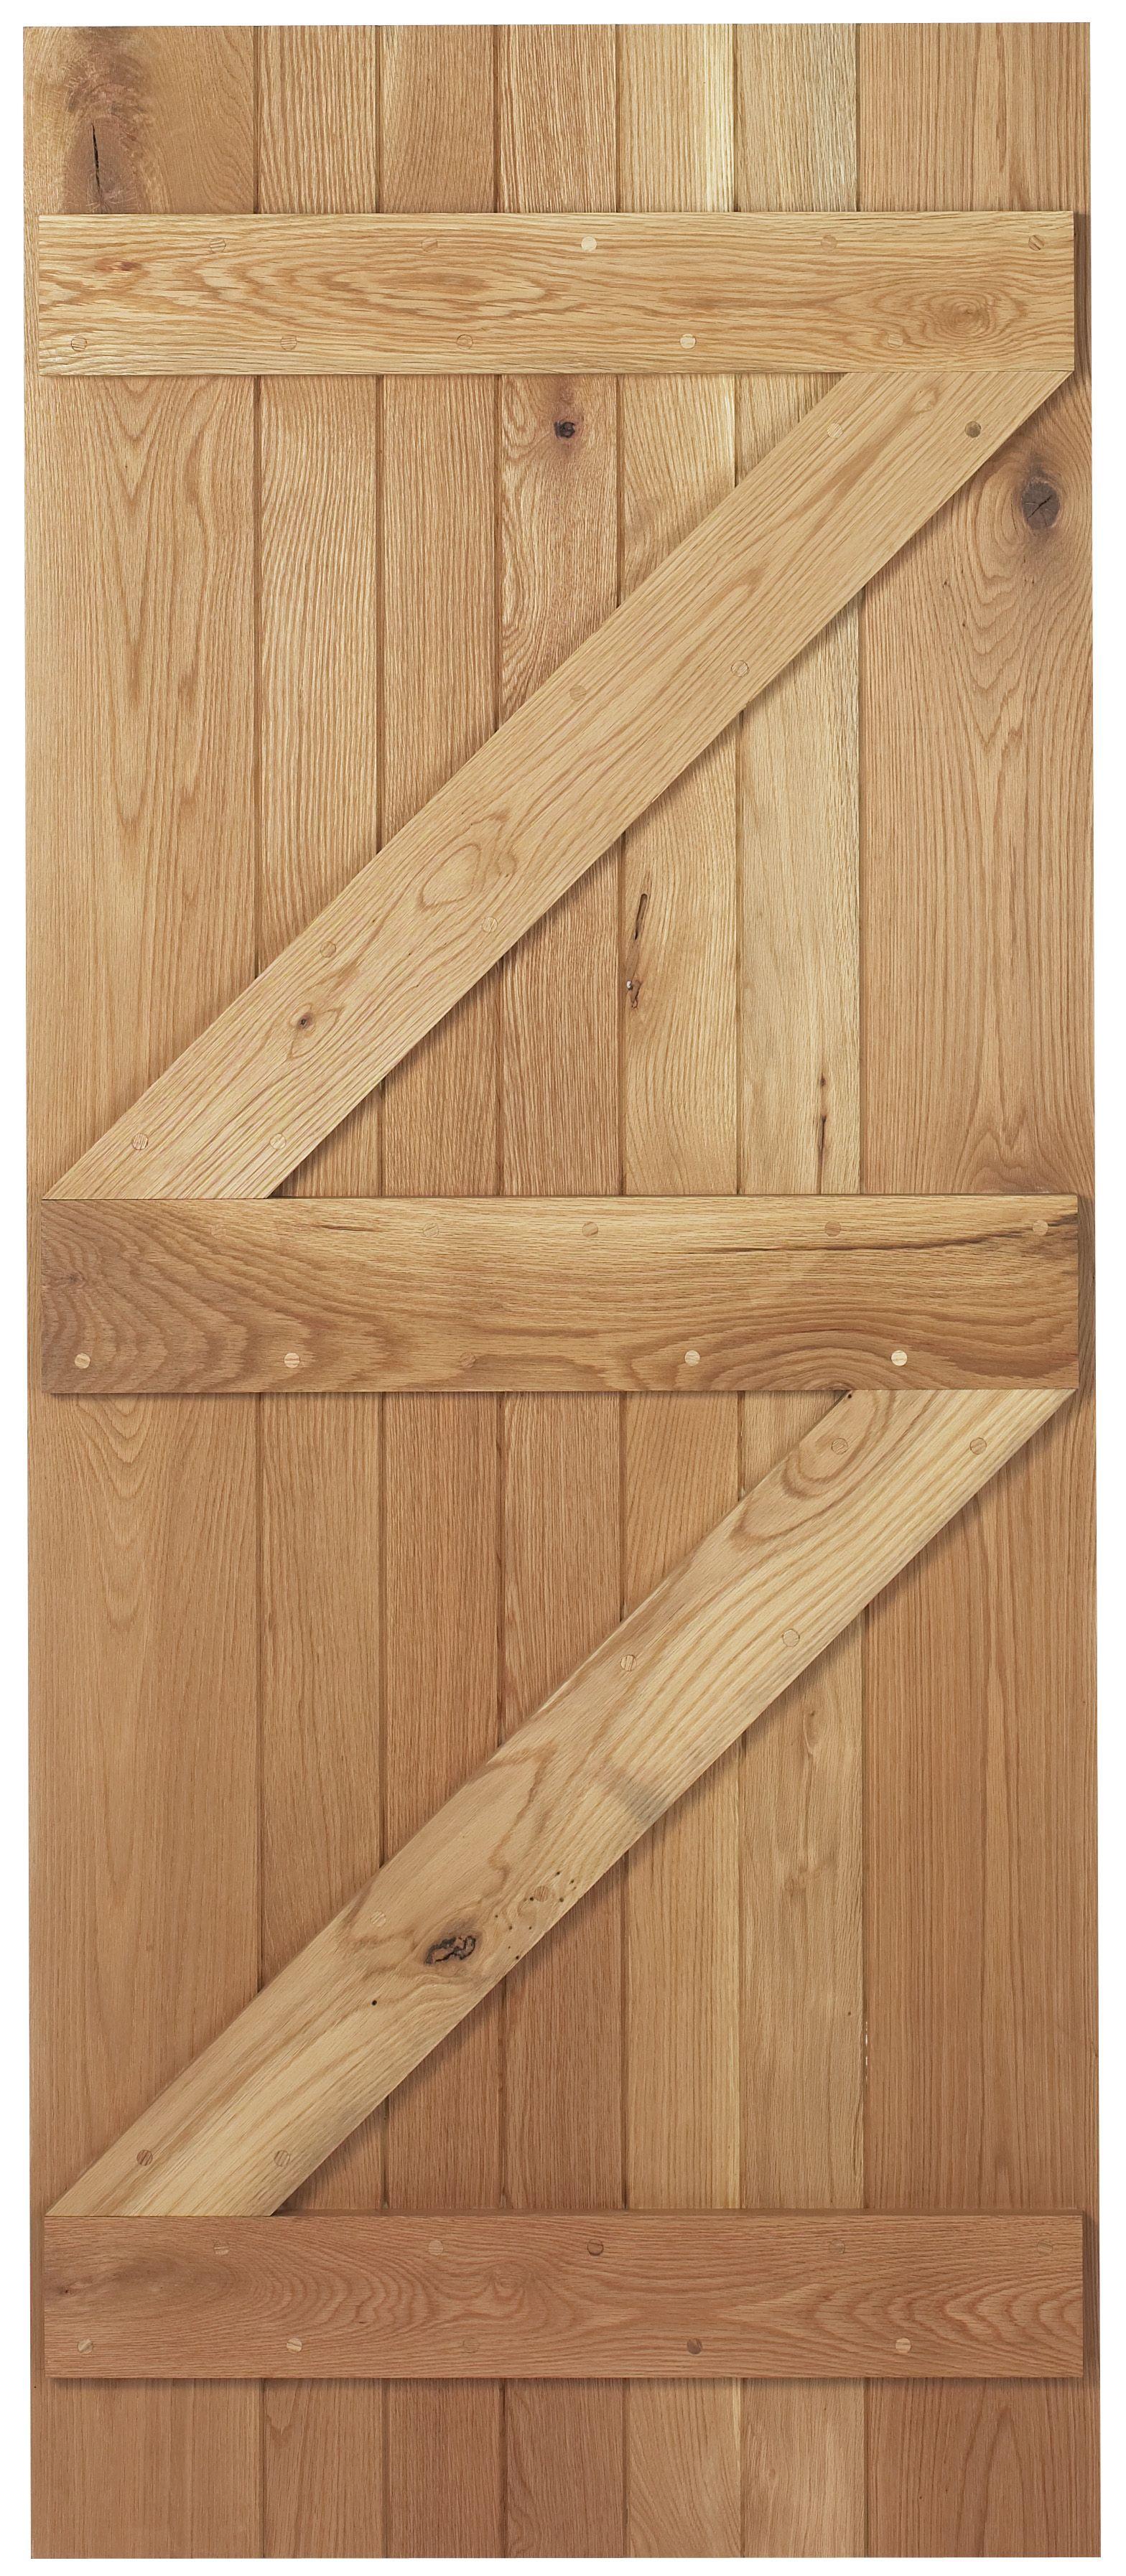 Oakwood doors provide a wide range of quality internal doors at competitive prices delivering UK wide. & plank doors   Internal Door Rustic Oak Ledged u0026 Braced Random ... pezcame.com